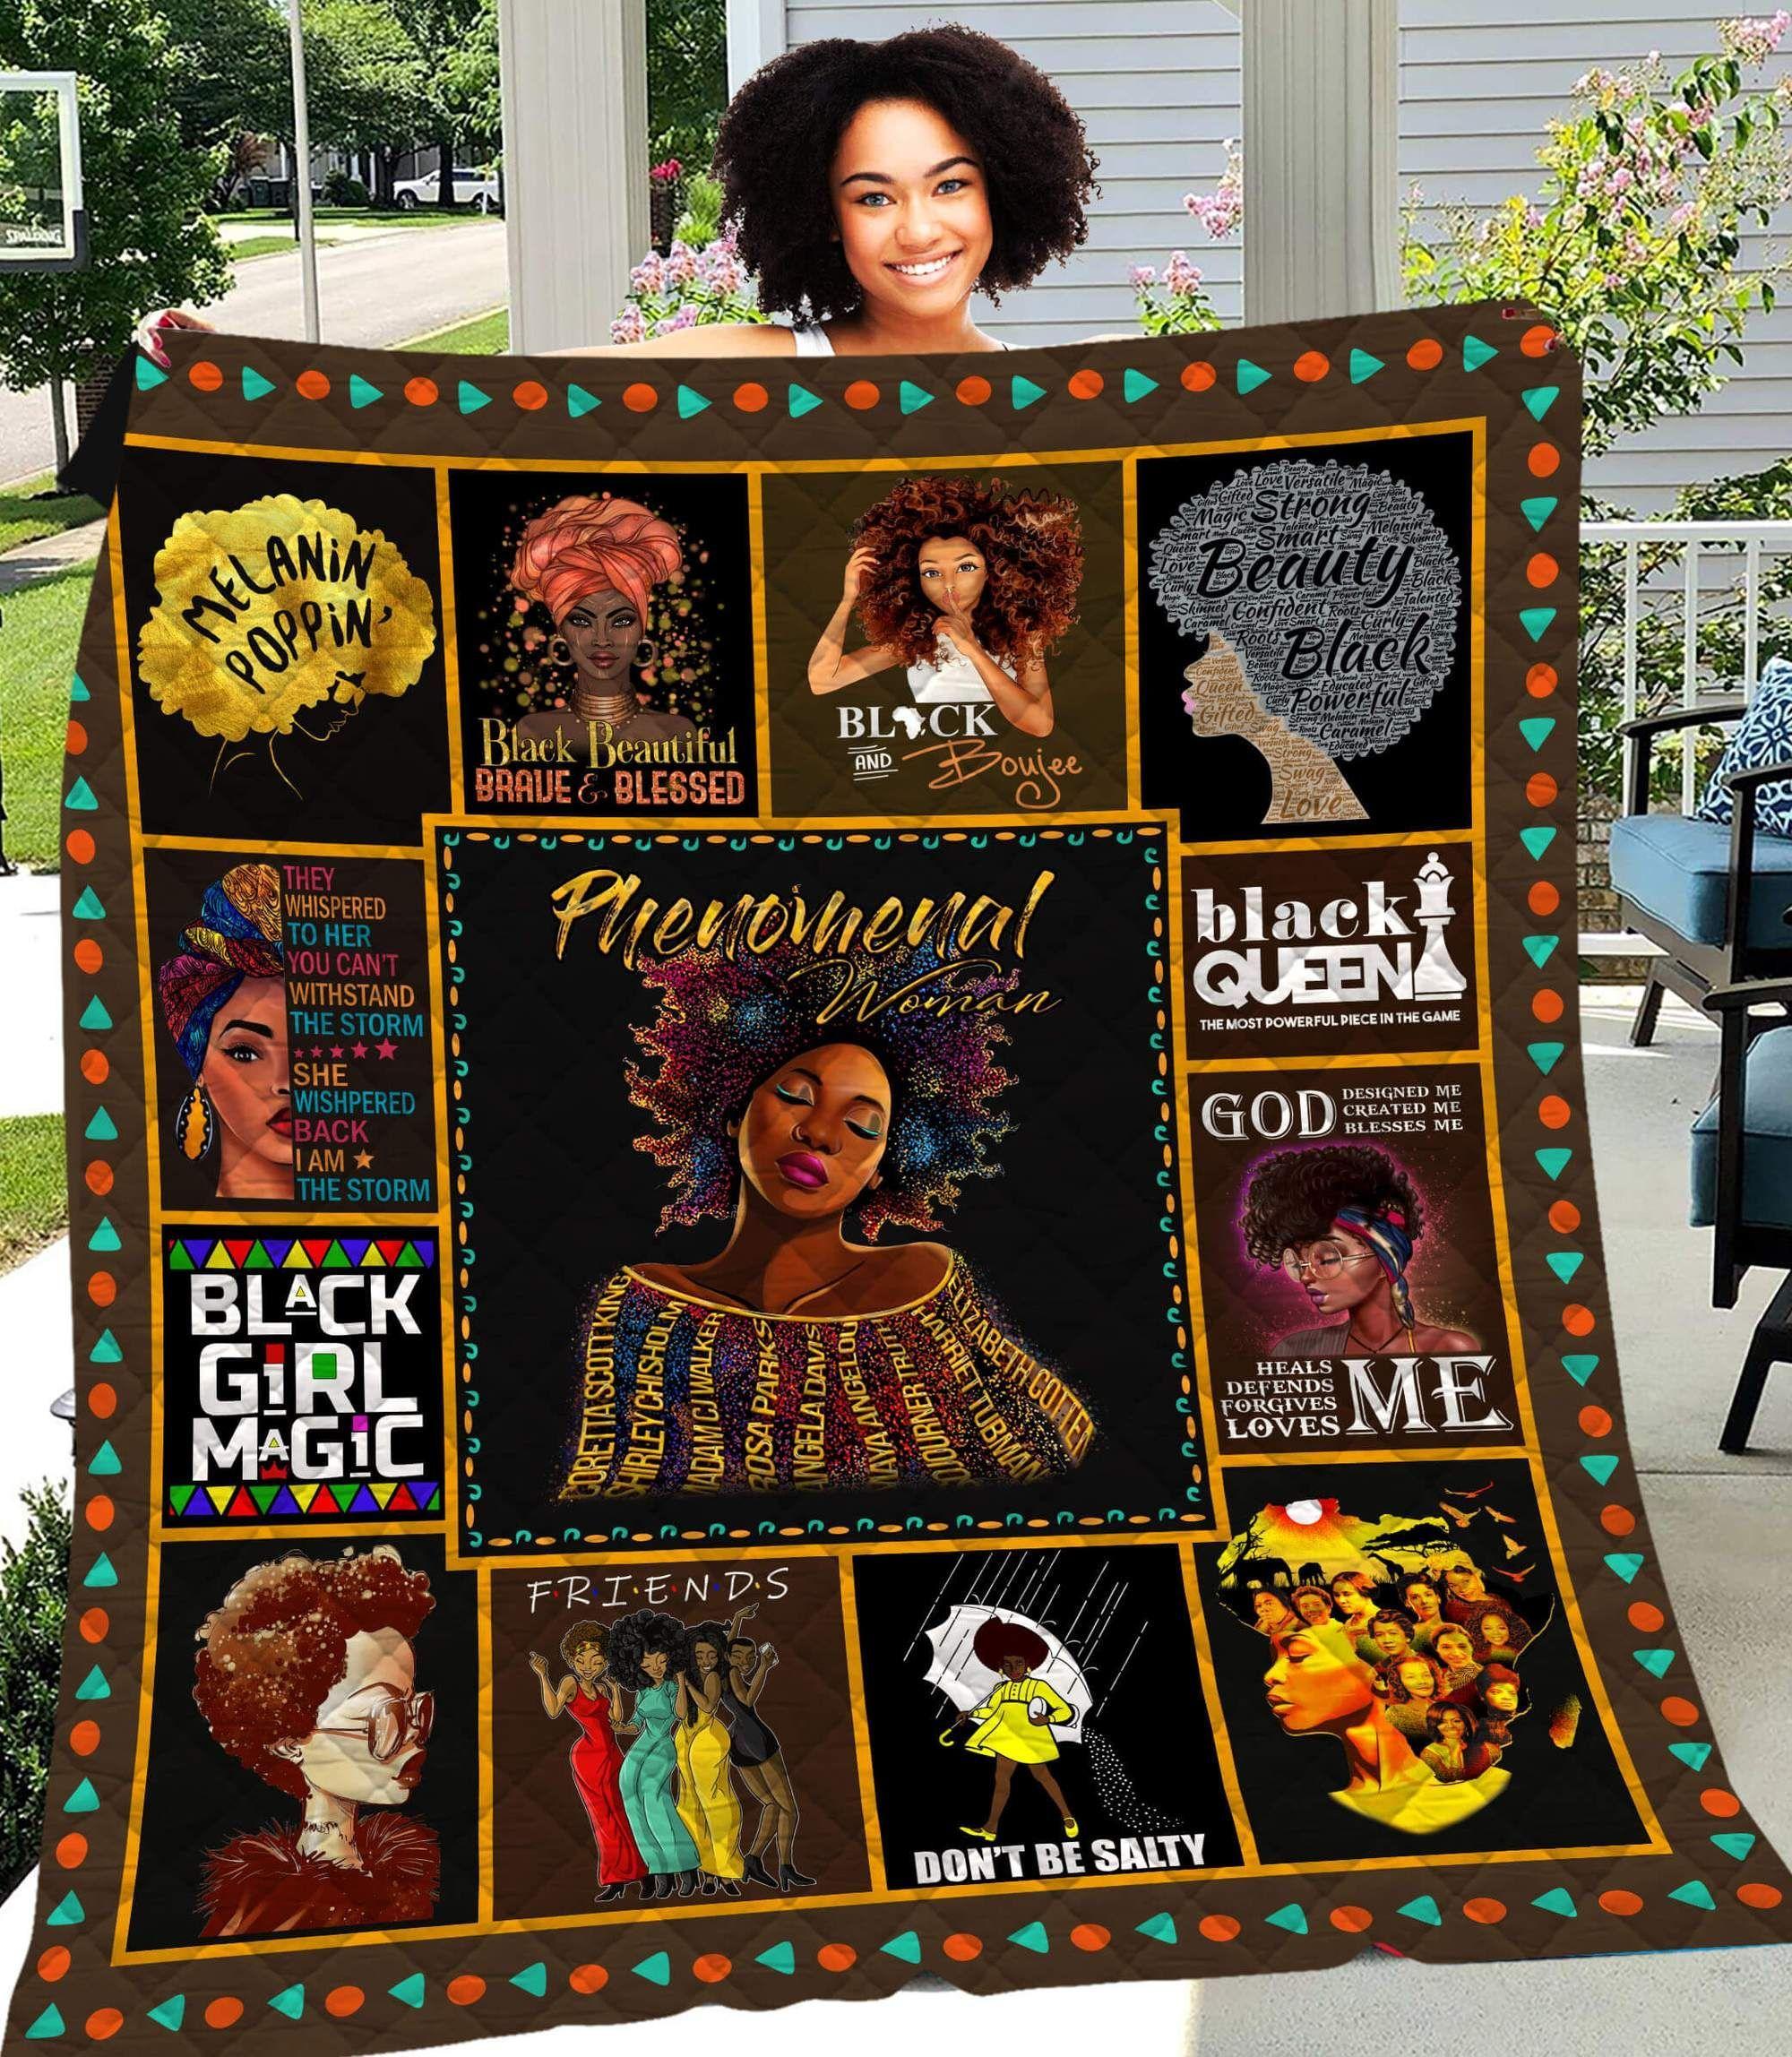 Phenomenal Women Afro Girl Magic CLM3110268 Quilt Blanket - Phenomenal Women Afro Girl Magic CLM31